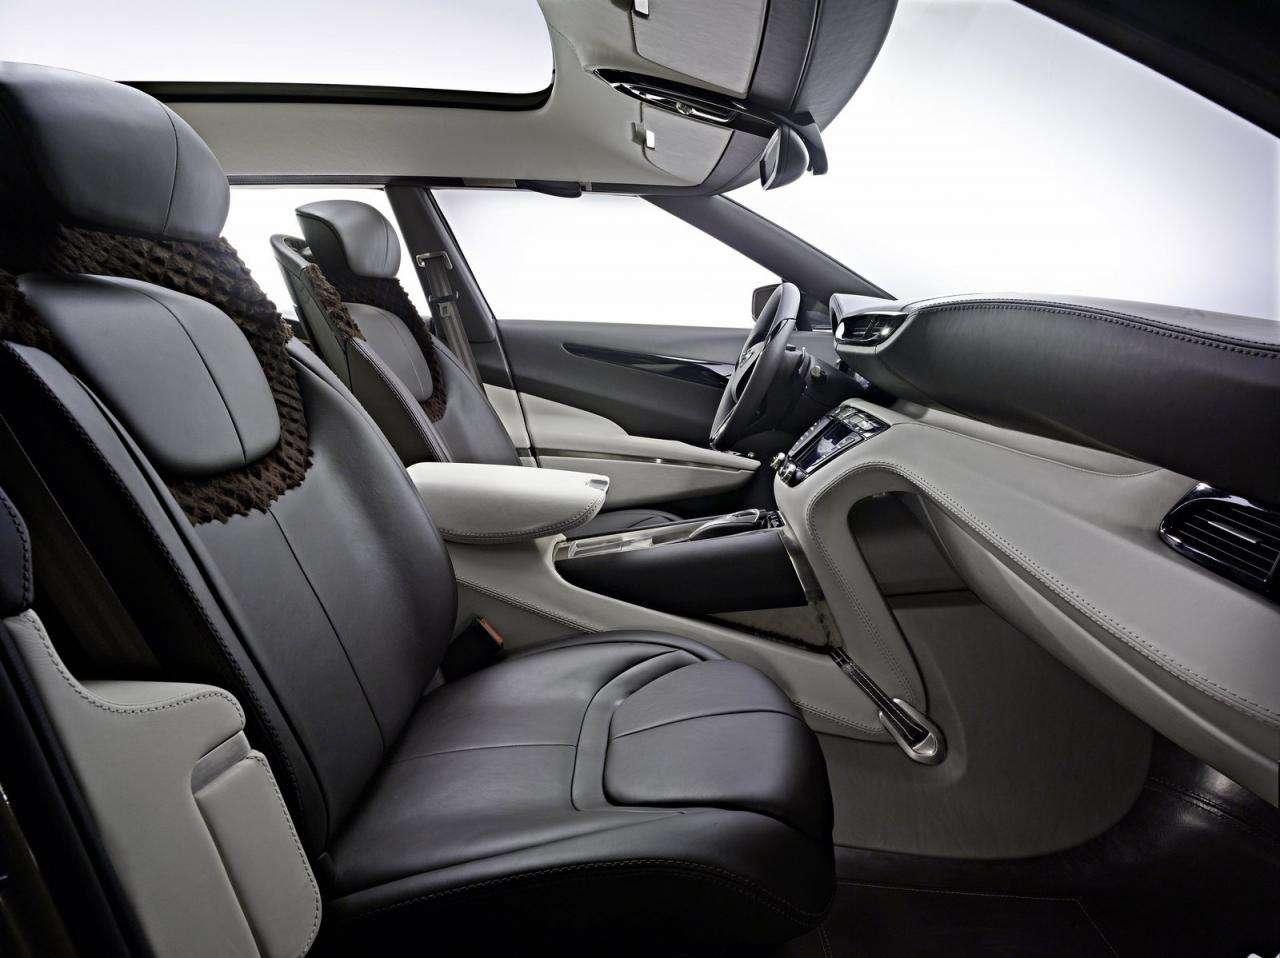 Aston Martin Lagonda concept new photo 2009